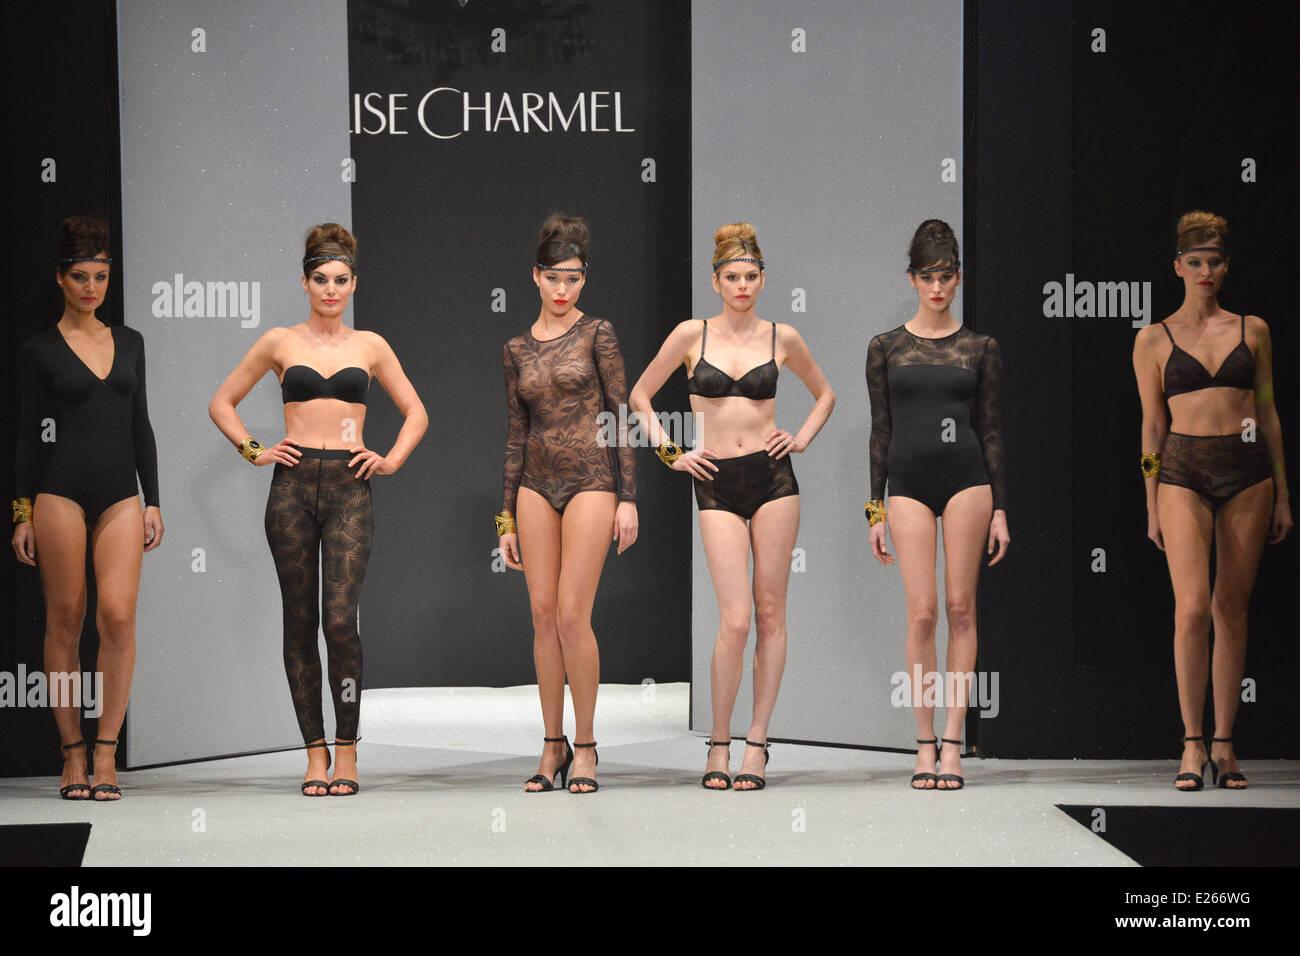 b607bbadb0 The Annual International Salon of Women's Lingerie - Lise Charmel - Catwalk  Featuring: Models Where: Paris, France When: 19 Jan 2013